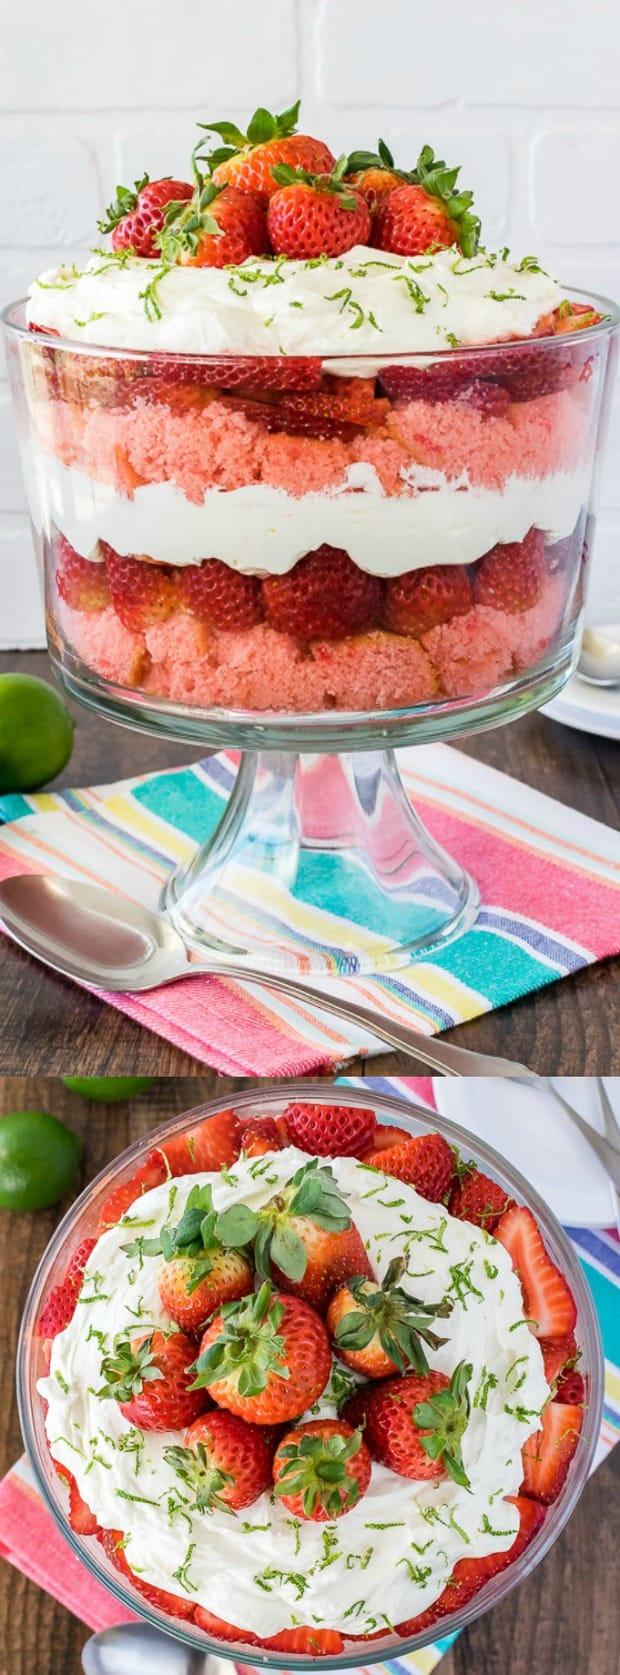 Strawberry Key Lime Cheesecake Trifle longpin